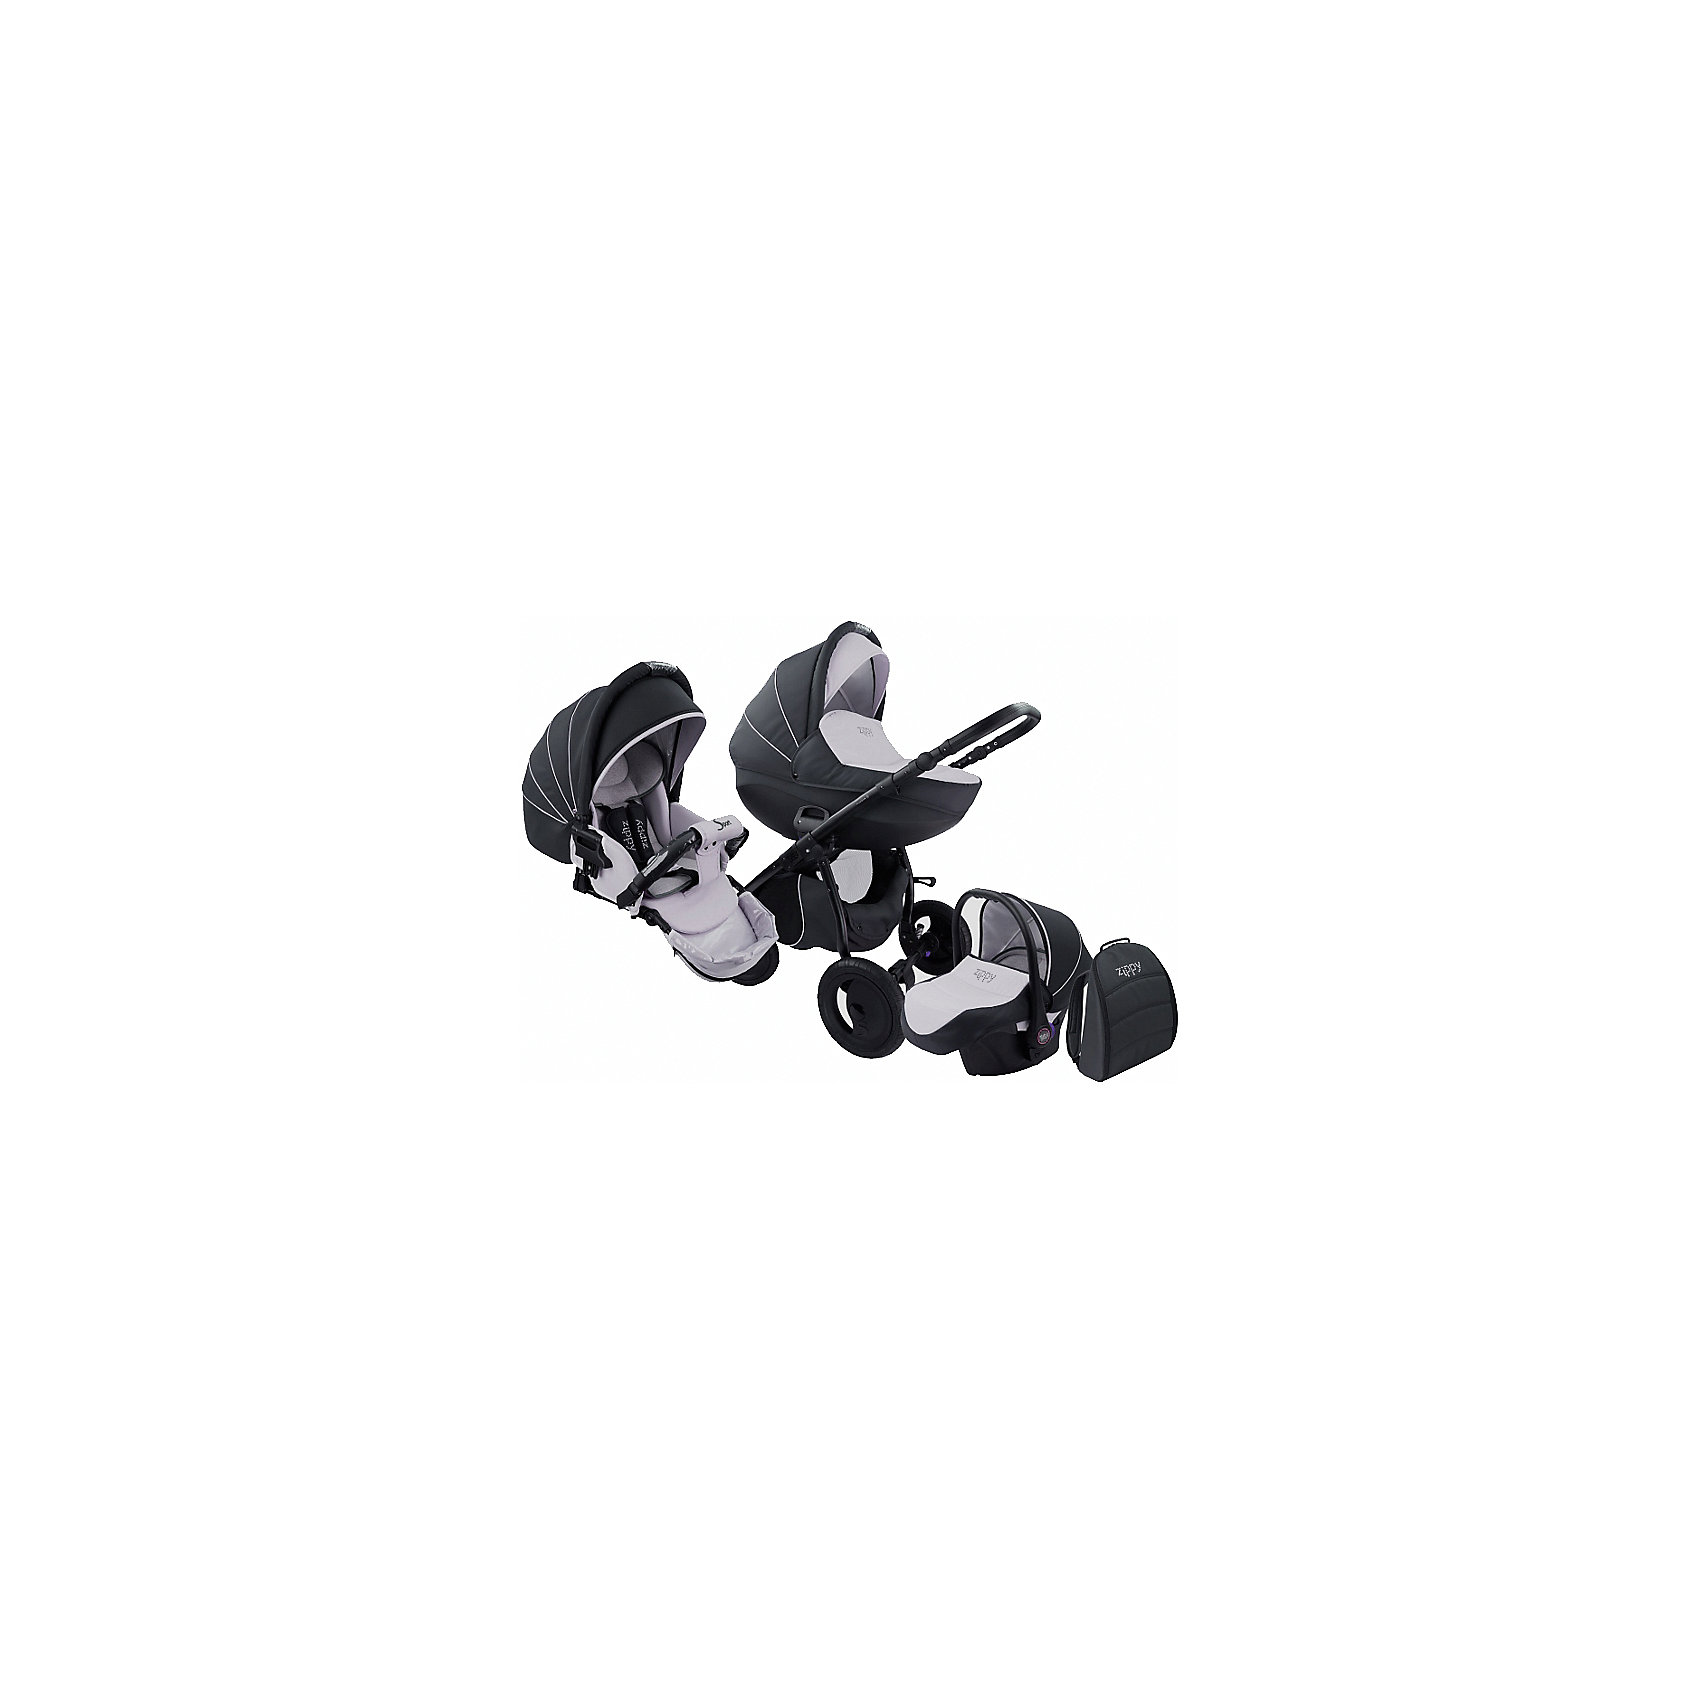 TUTIS Коляска 3 в 1 Zippy Sport Plus, Tutis, темно-серый/светло-серый